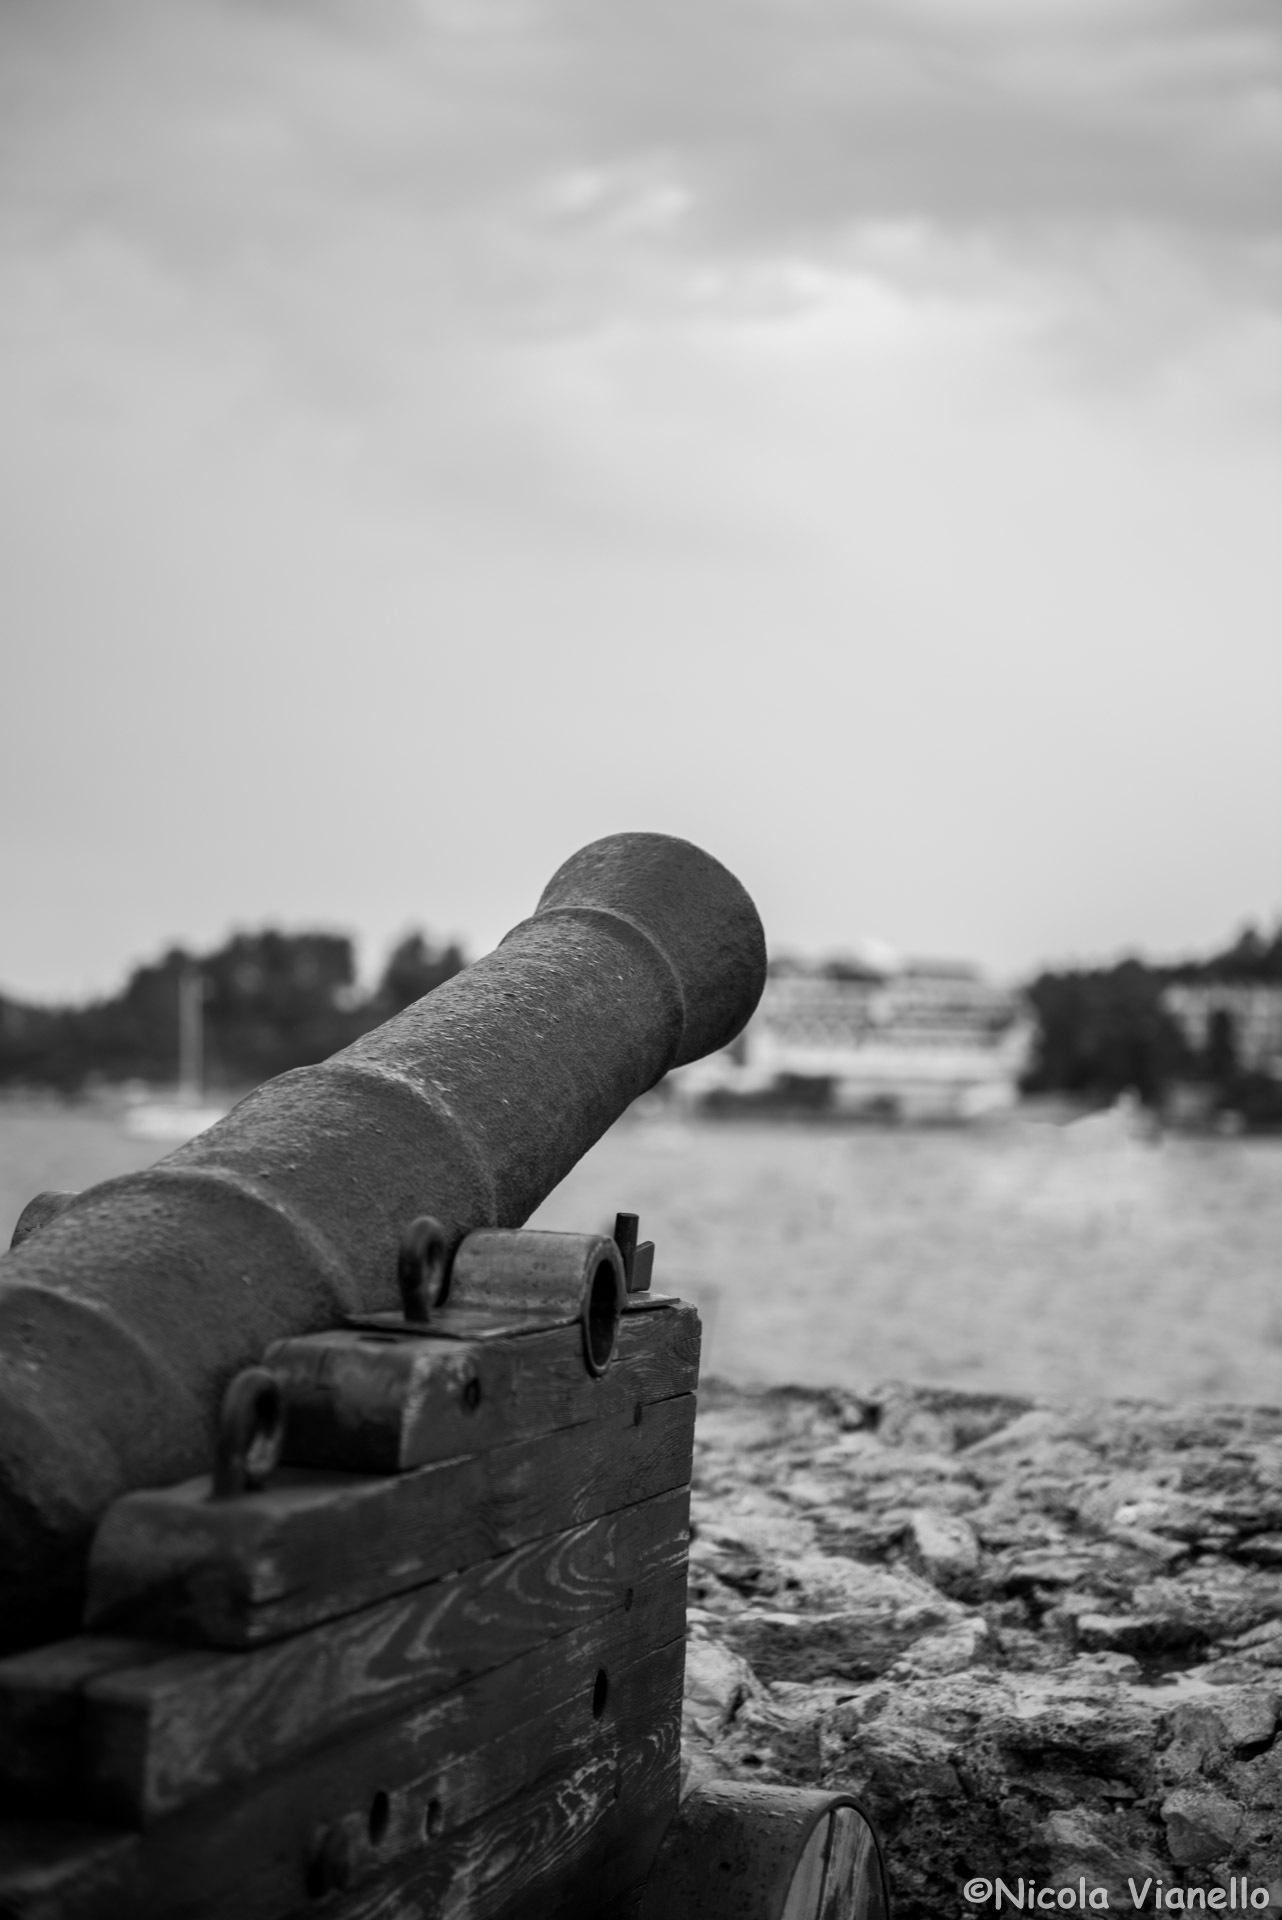 Ready to fire! by Nicola Vianello